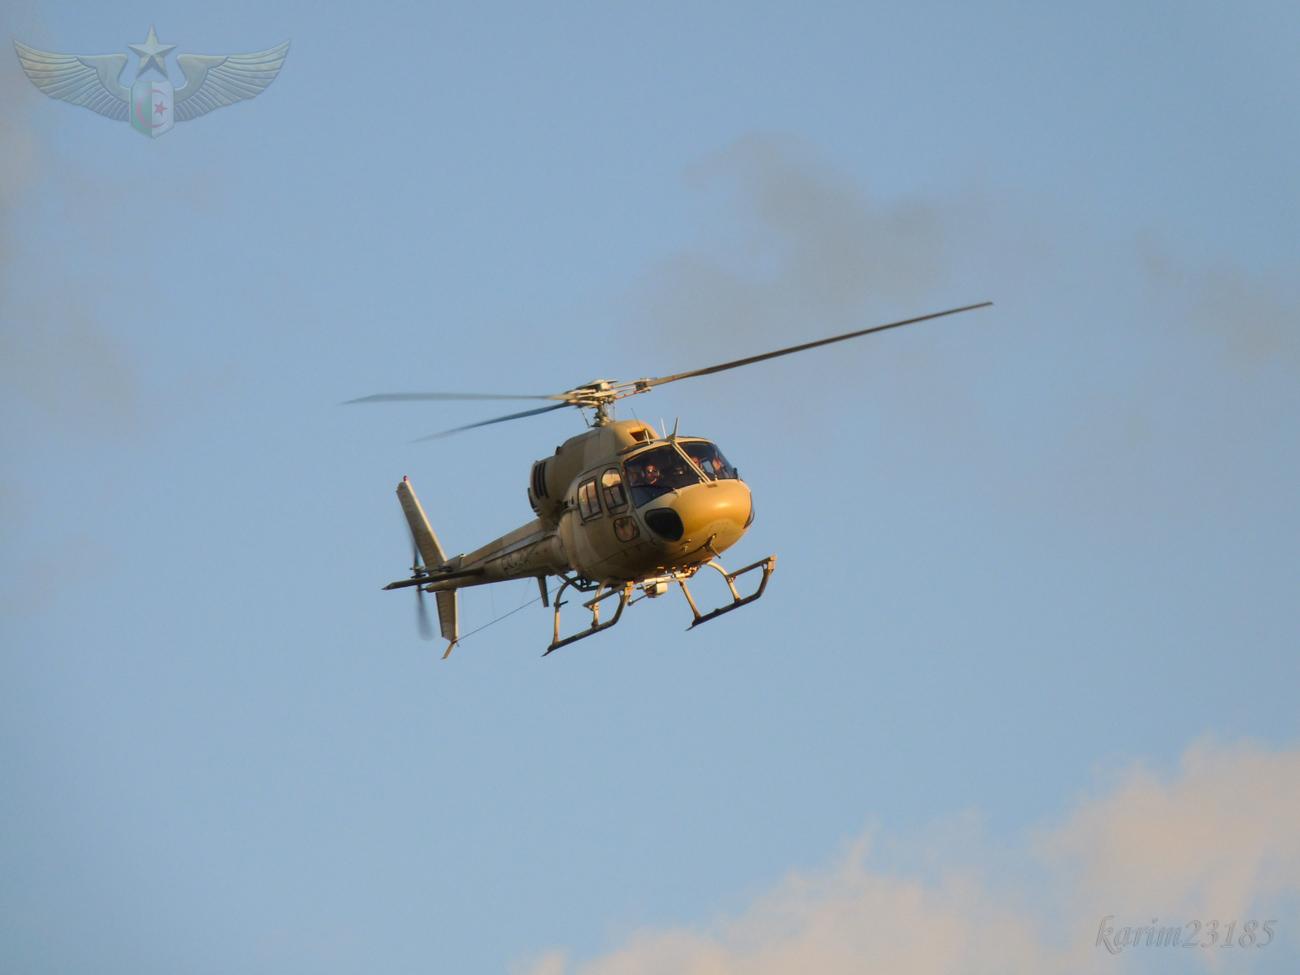 صور مروحيات القوات الجوية الجزائرية Ecureuil/Fennec ] AS-355N2 / AS-555N ] - صفحة 6 27611605395_0d8814c0a7_o